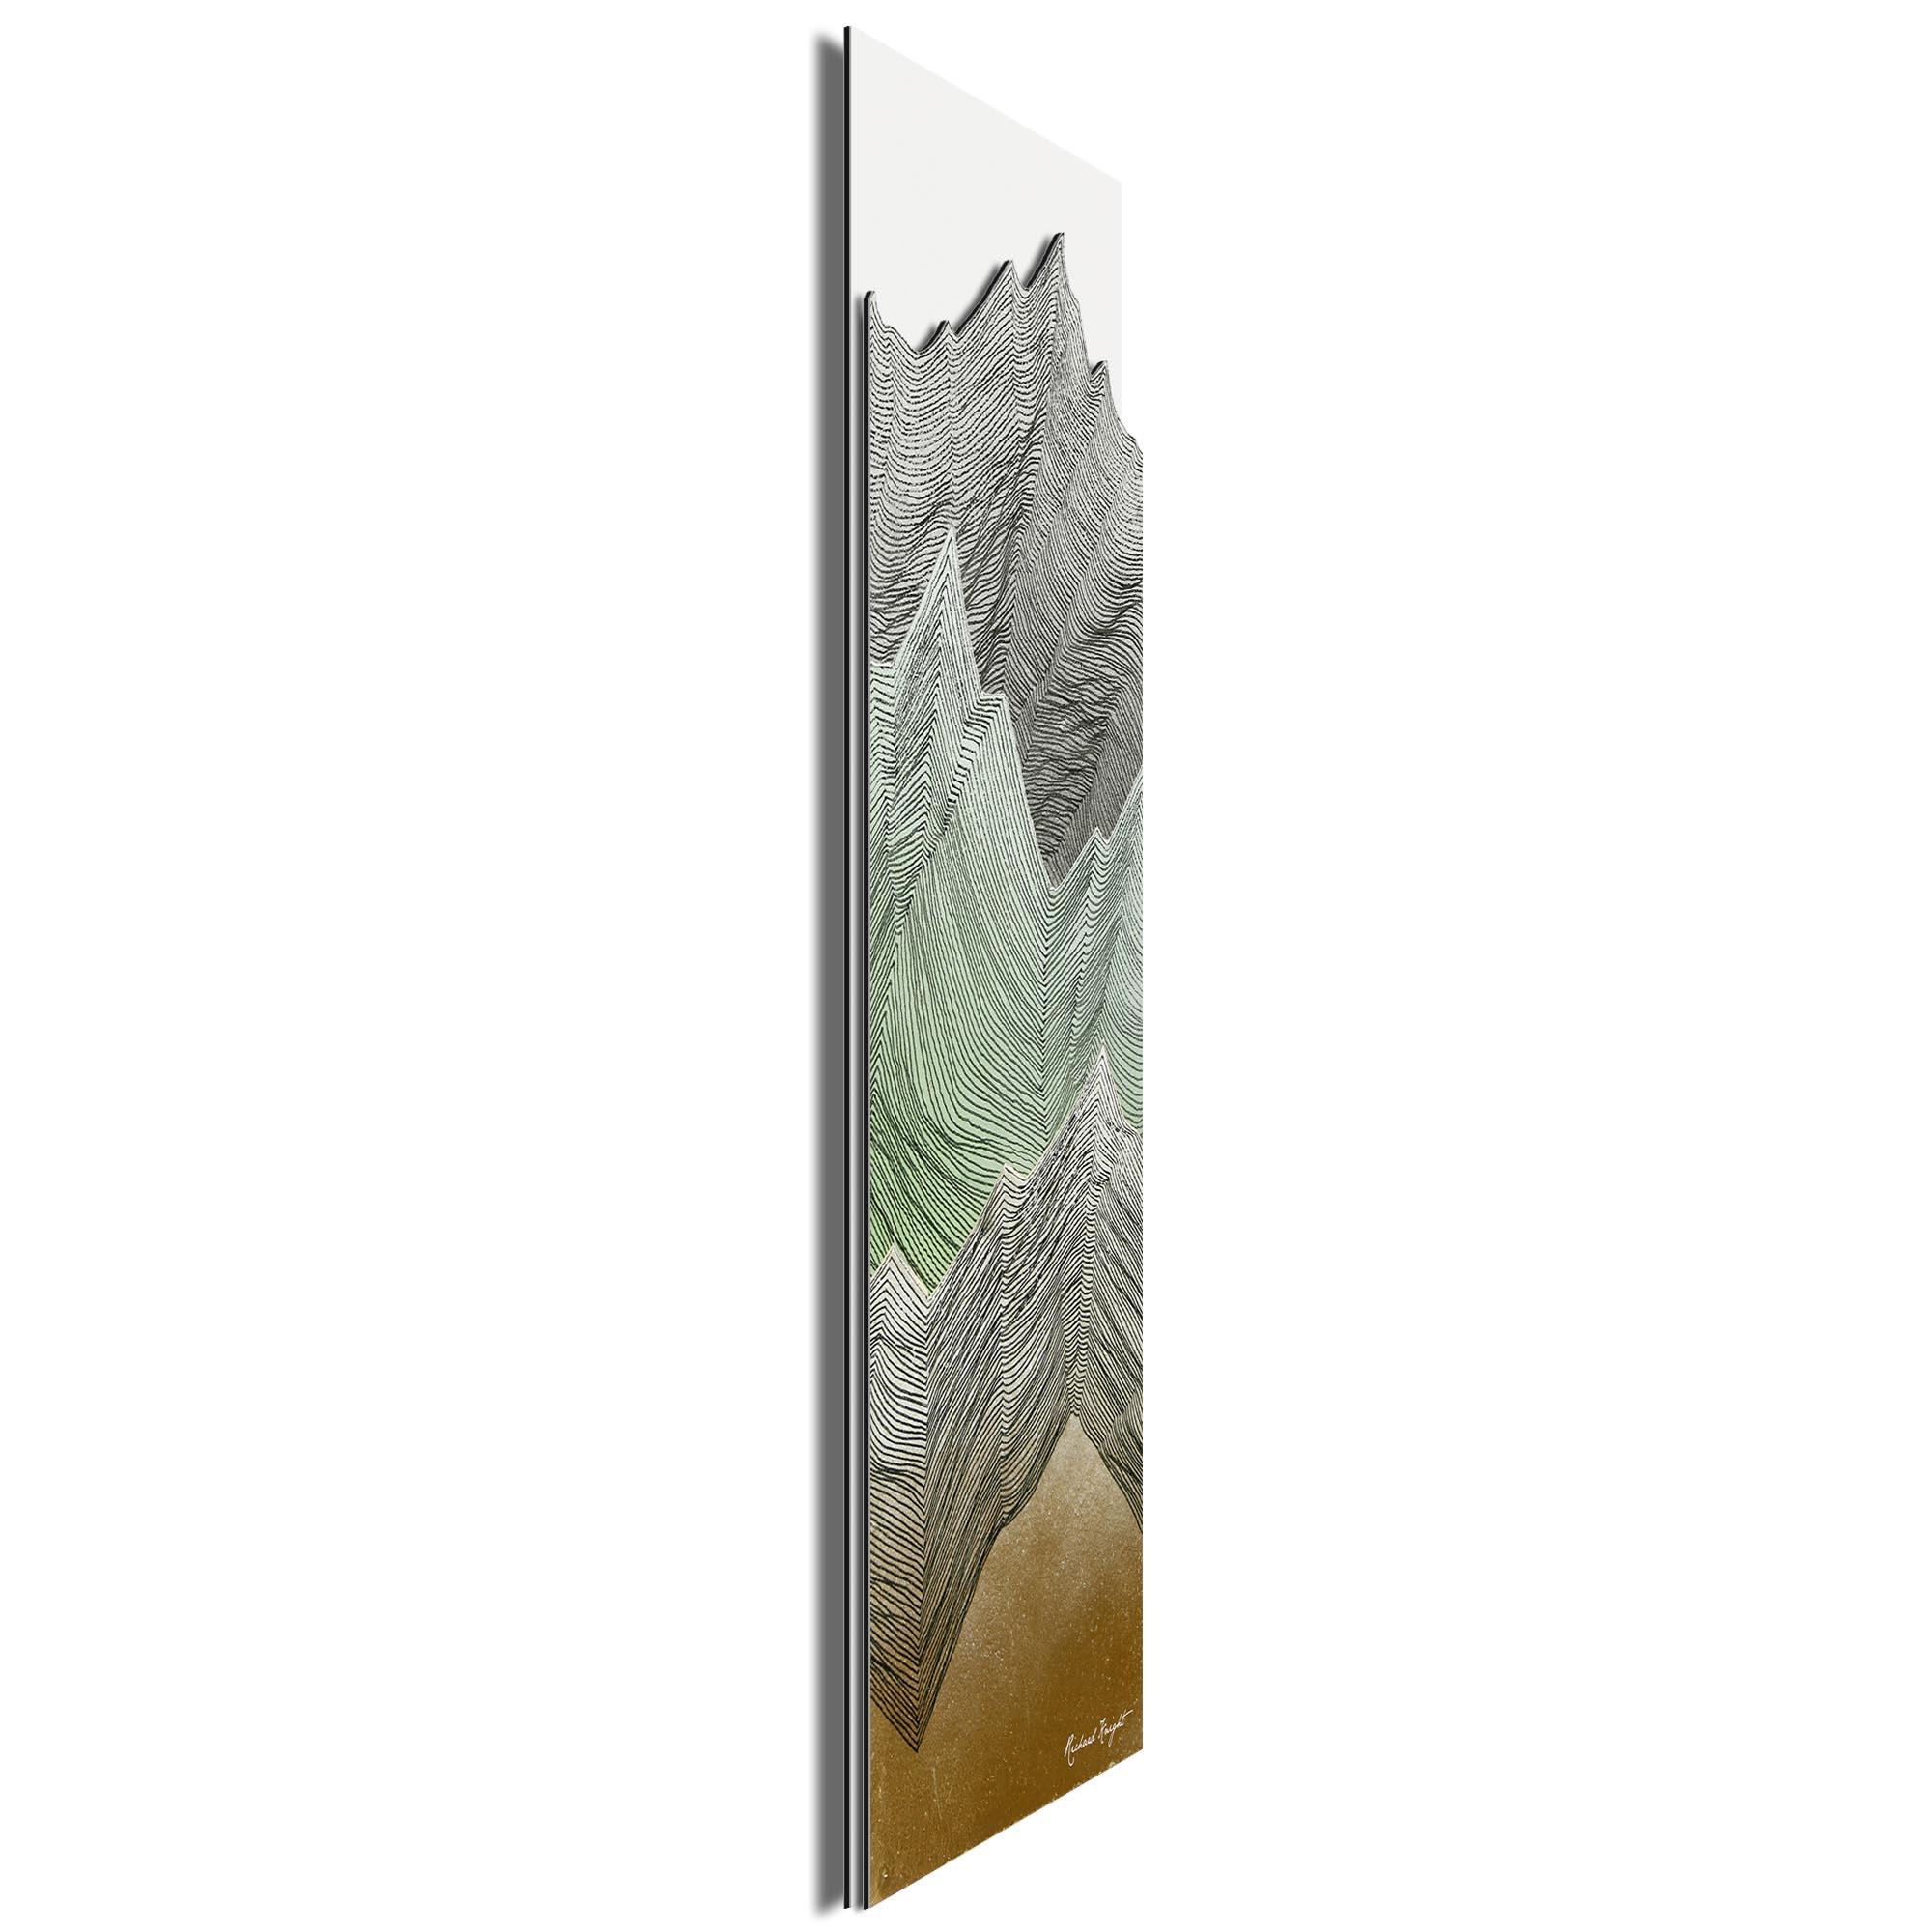 Mint Peaks by Richard Knight - Ltd. Ed. Minimalist Abstract Landscape Art - Image 2